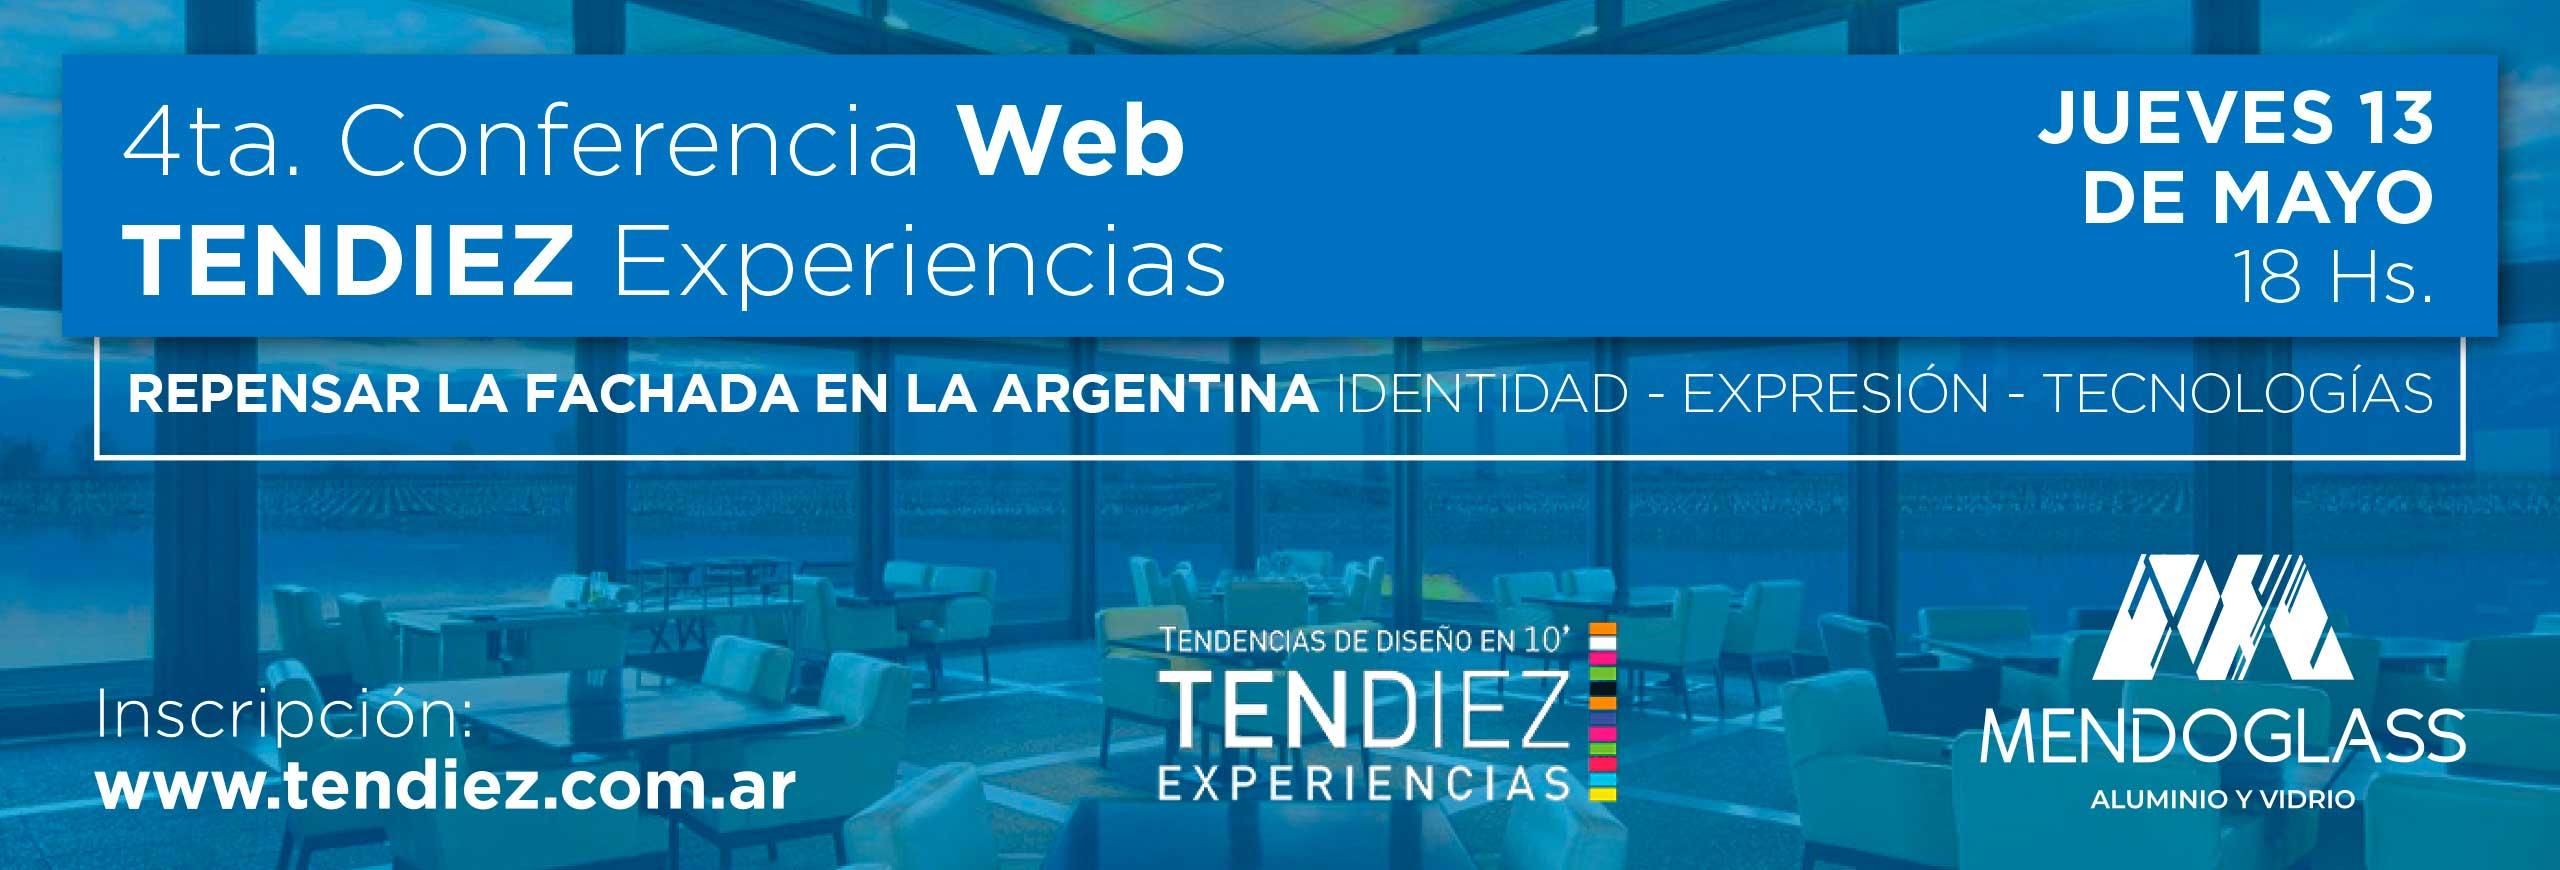 Web-Mendoglass-TenD